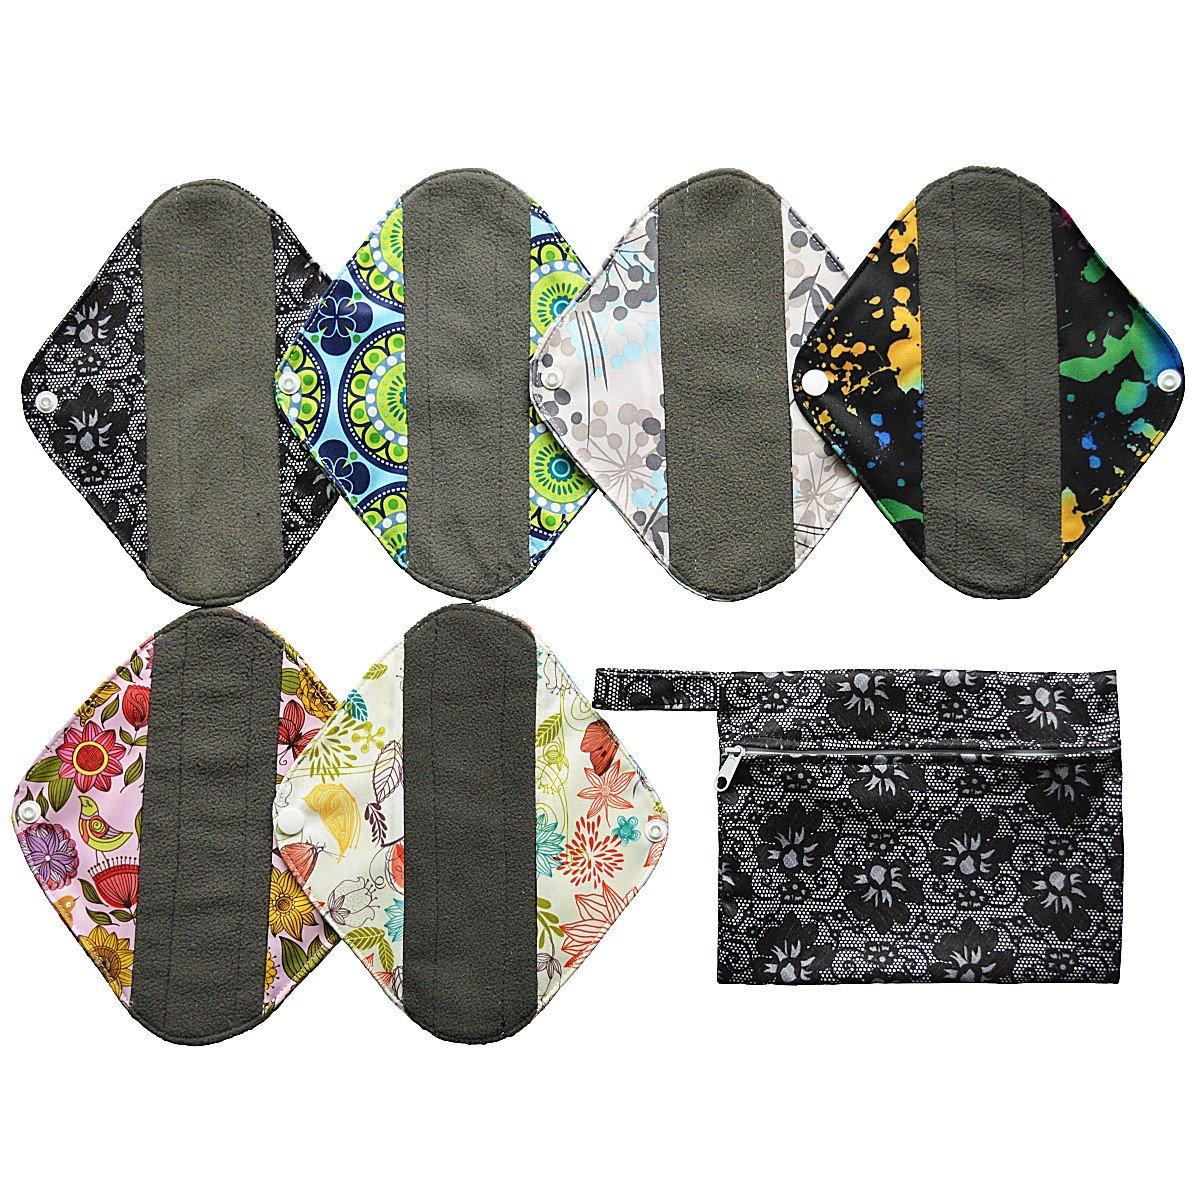 7pcs Set 1pc Mini Wet Bag +6pcs 8 Inch Charcoal Bamboo Mama Cloth/ Menstrual Pads/ Reusable Sanitary Pads / Panty Liners